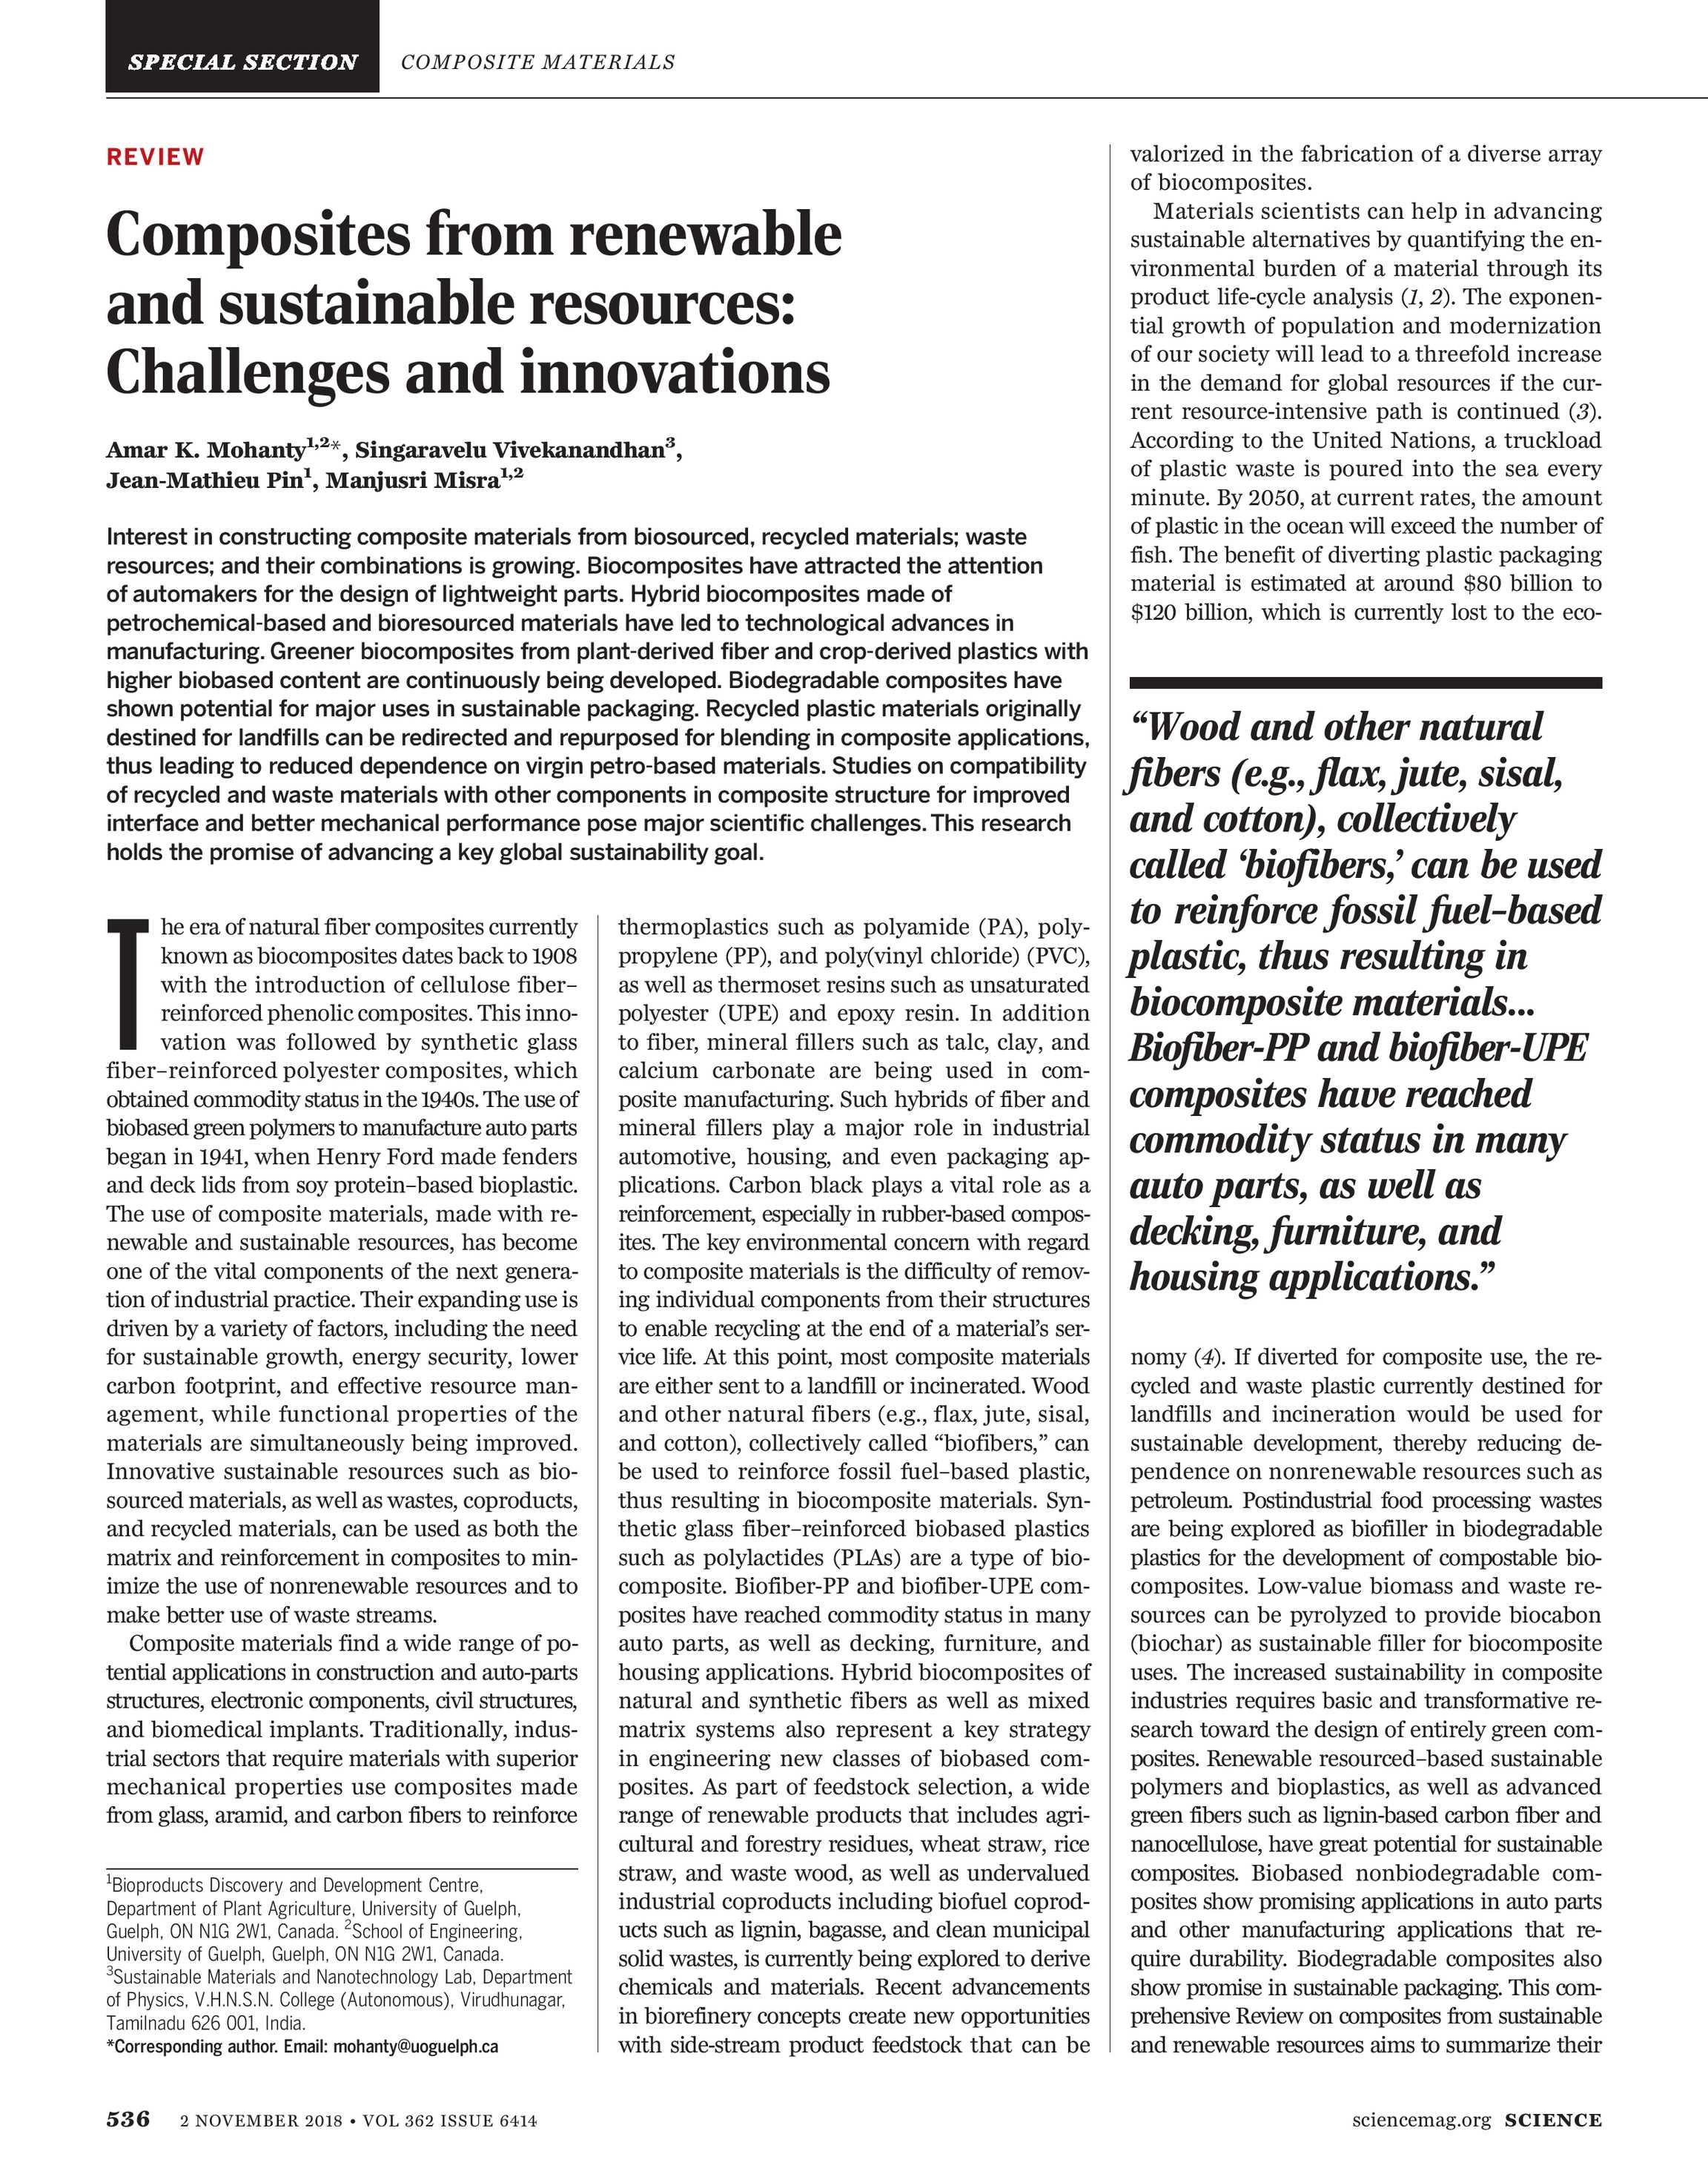 Science Magazine - November 2, 2018 - page 536